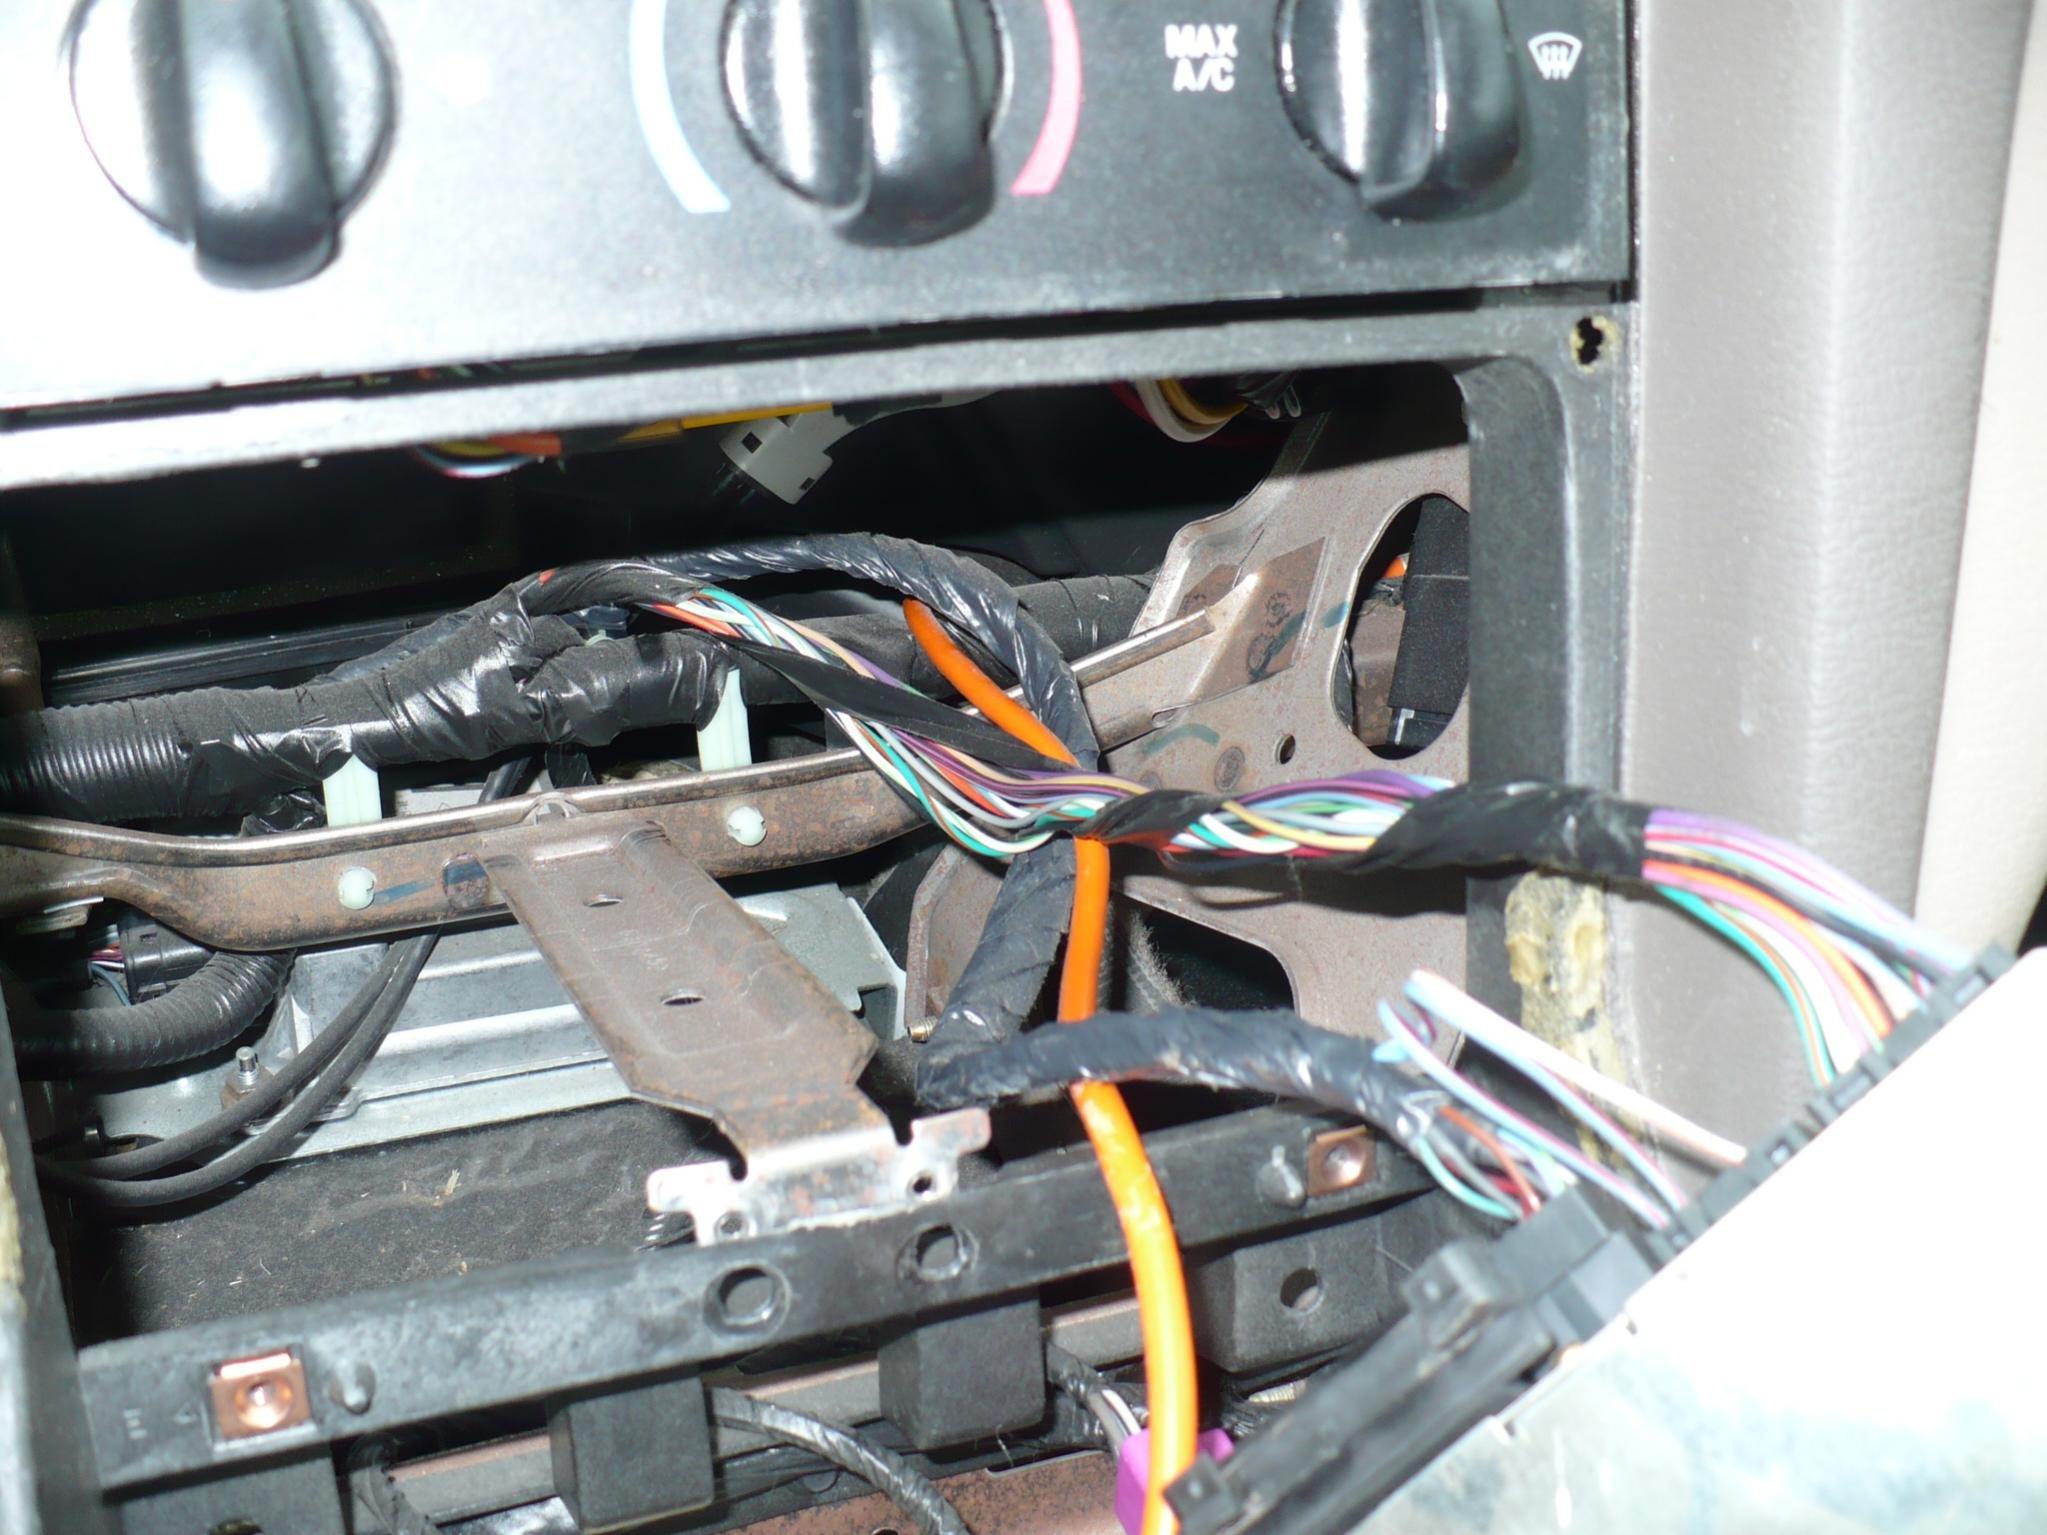 2002 ford econoline radio wiring diagram 12v downlight transformer toyskids co mach 460 6 disc cd changer problems mustang forum